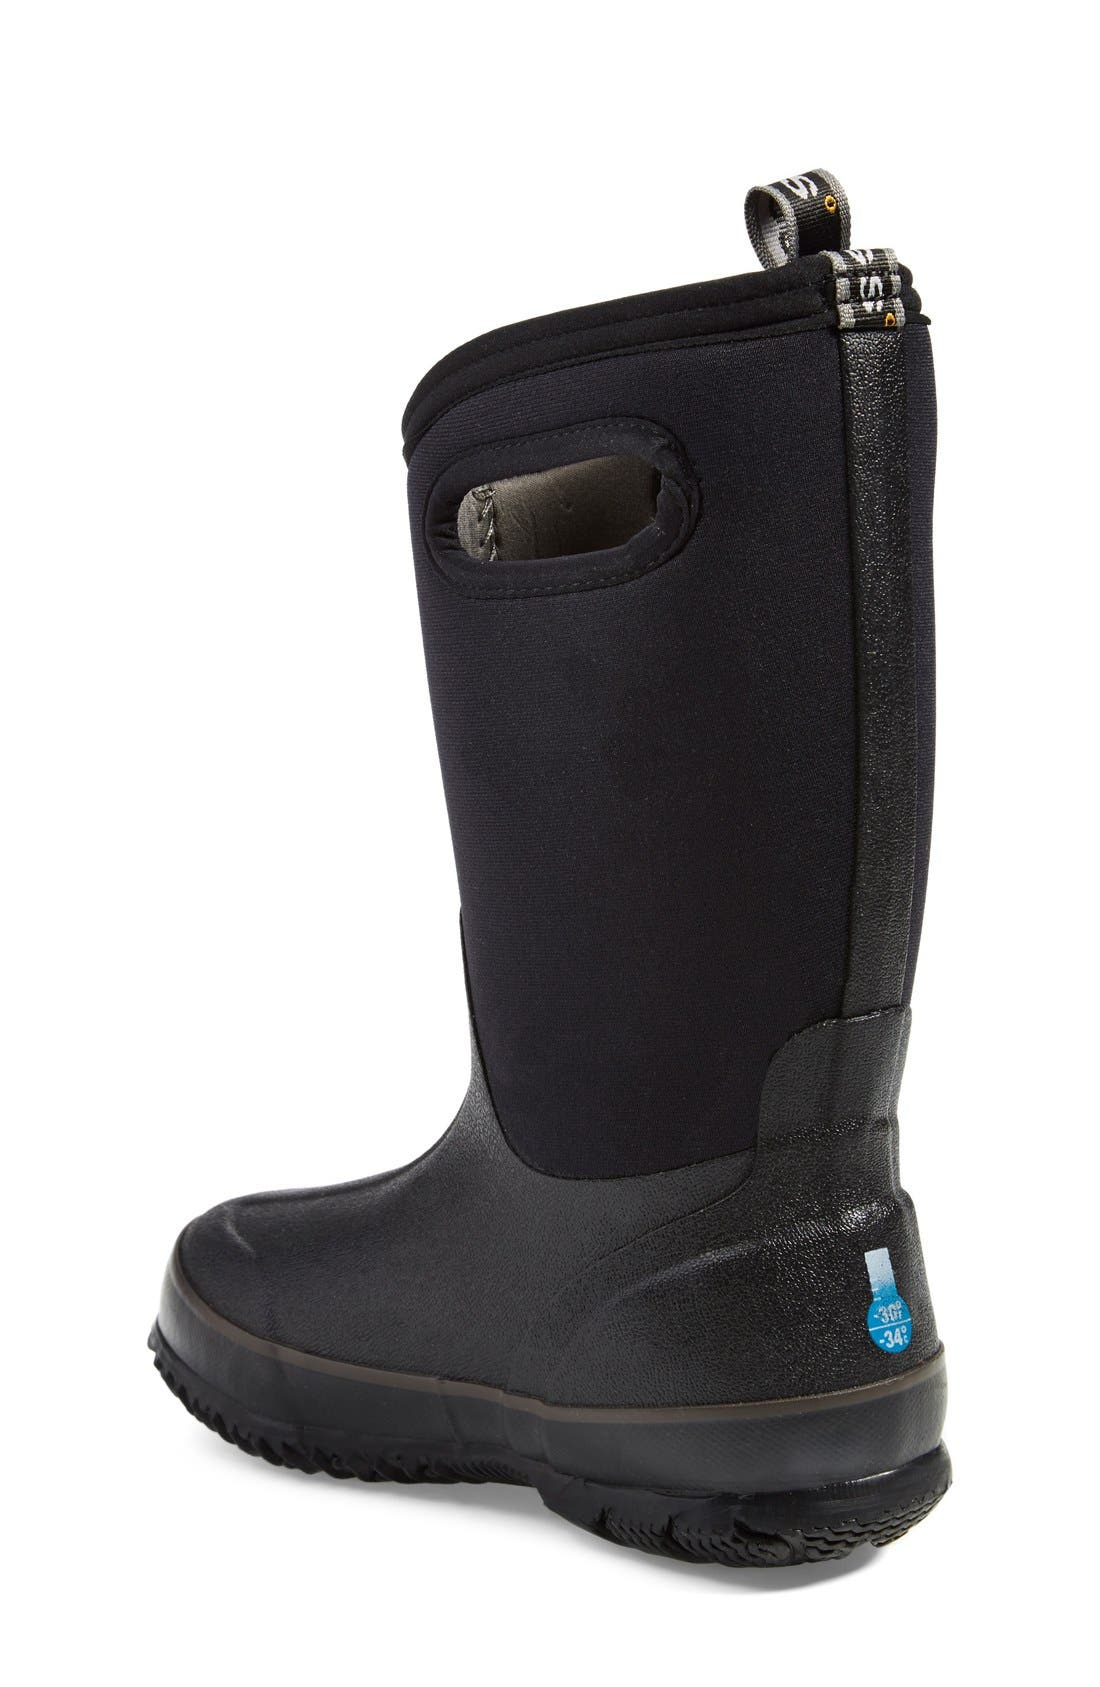 Bogs Shoes | Nordstrom